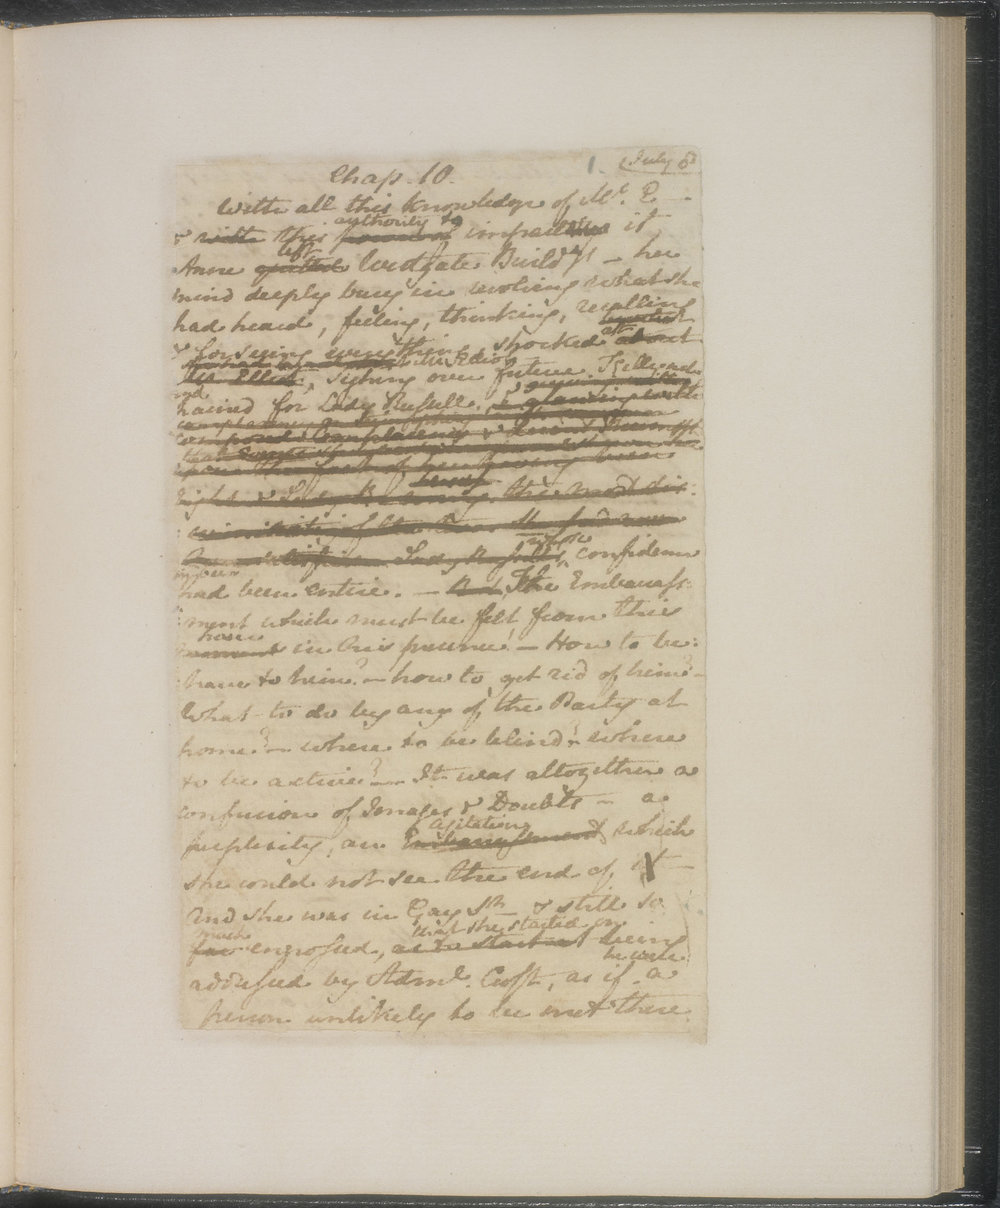 austen jane manuscript c08315 04.jpg